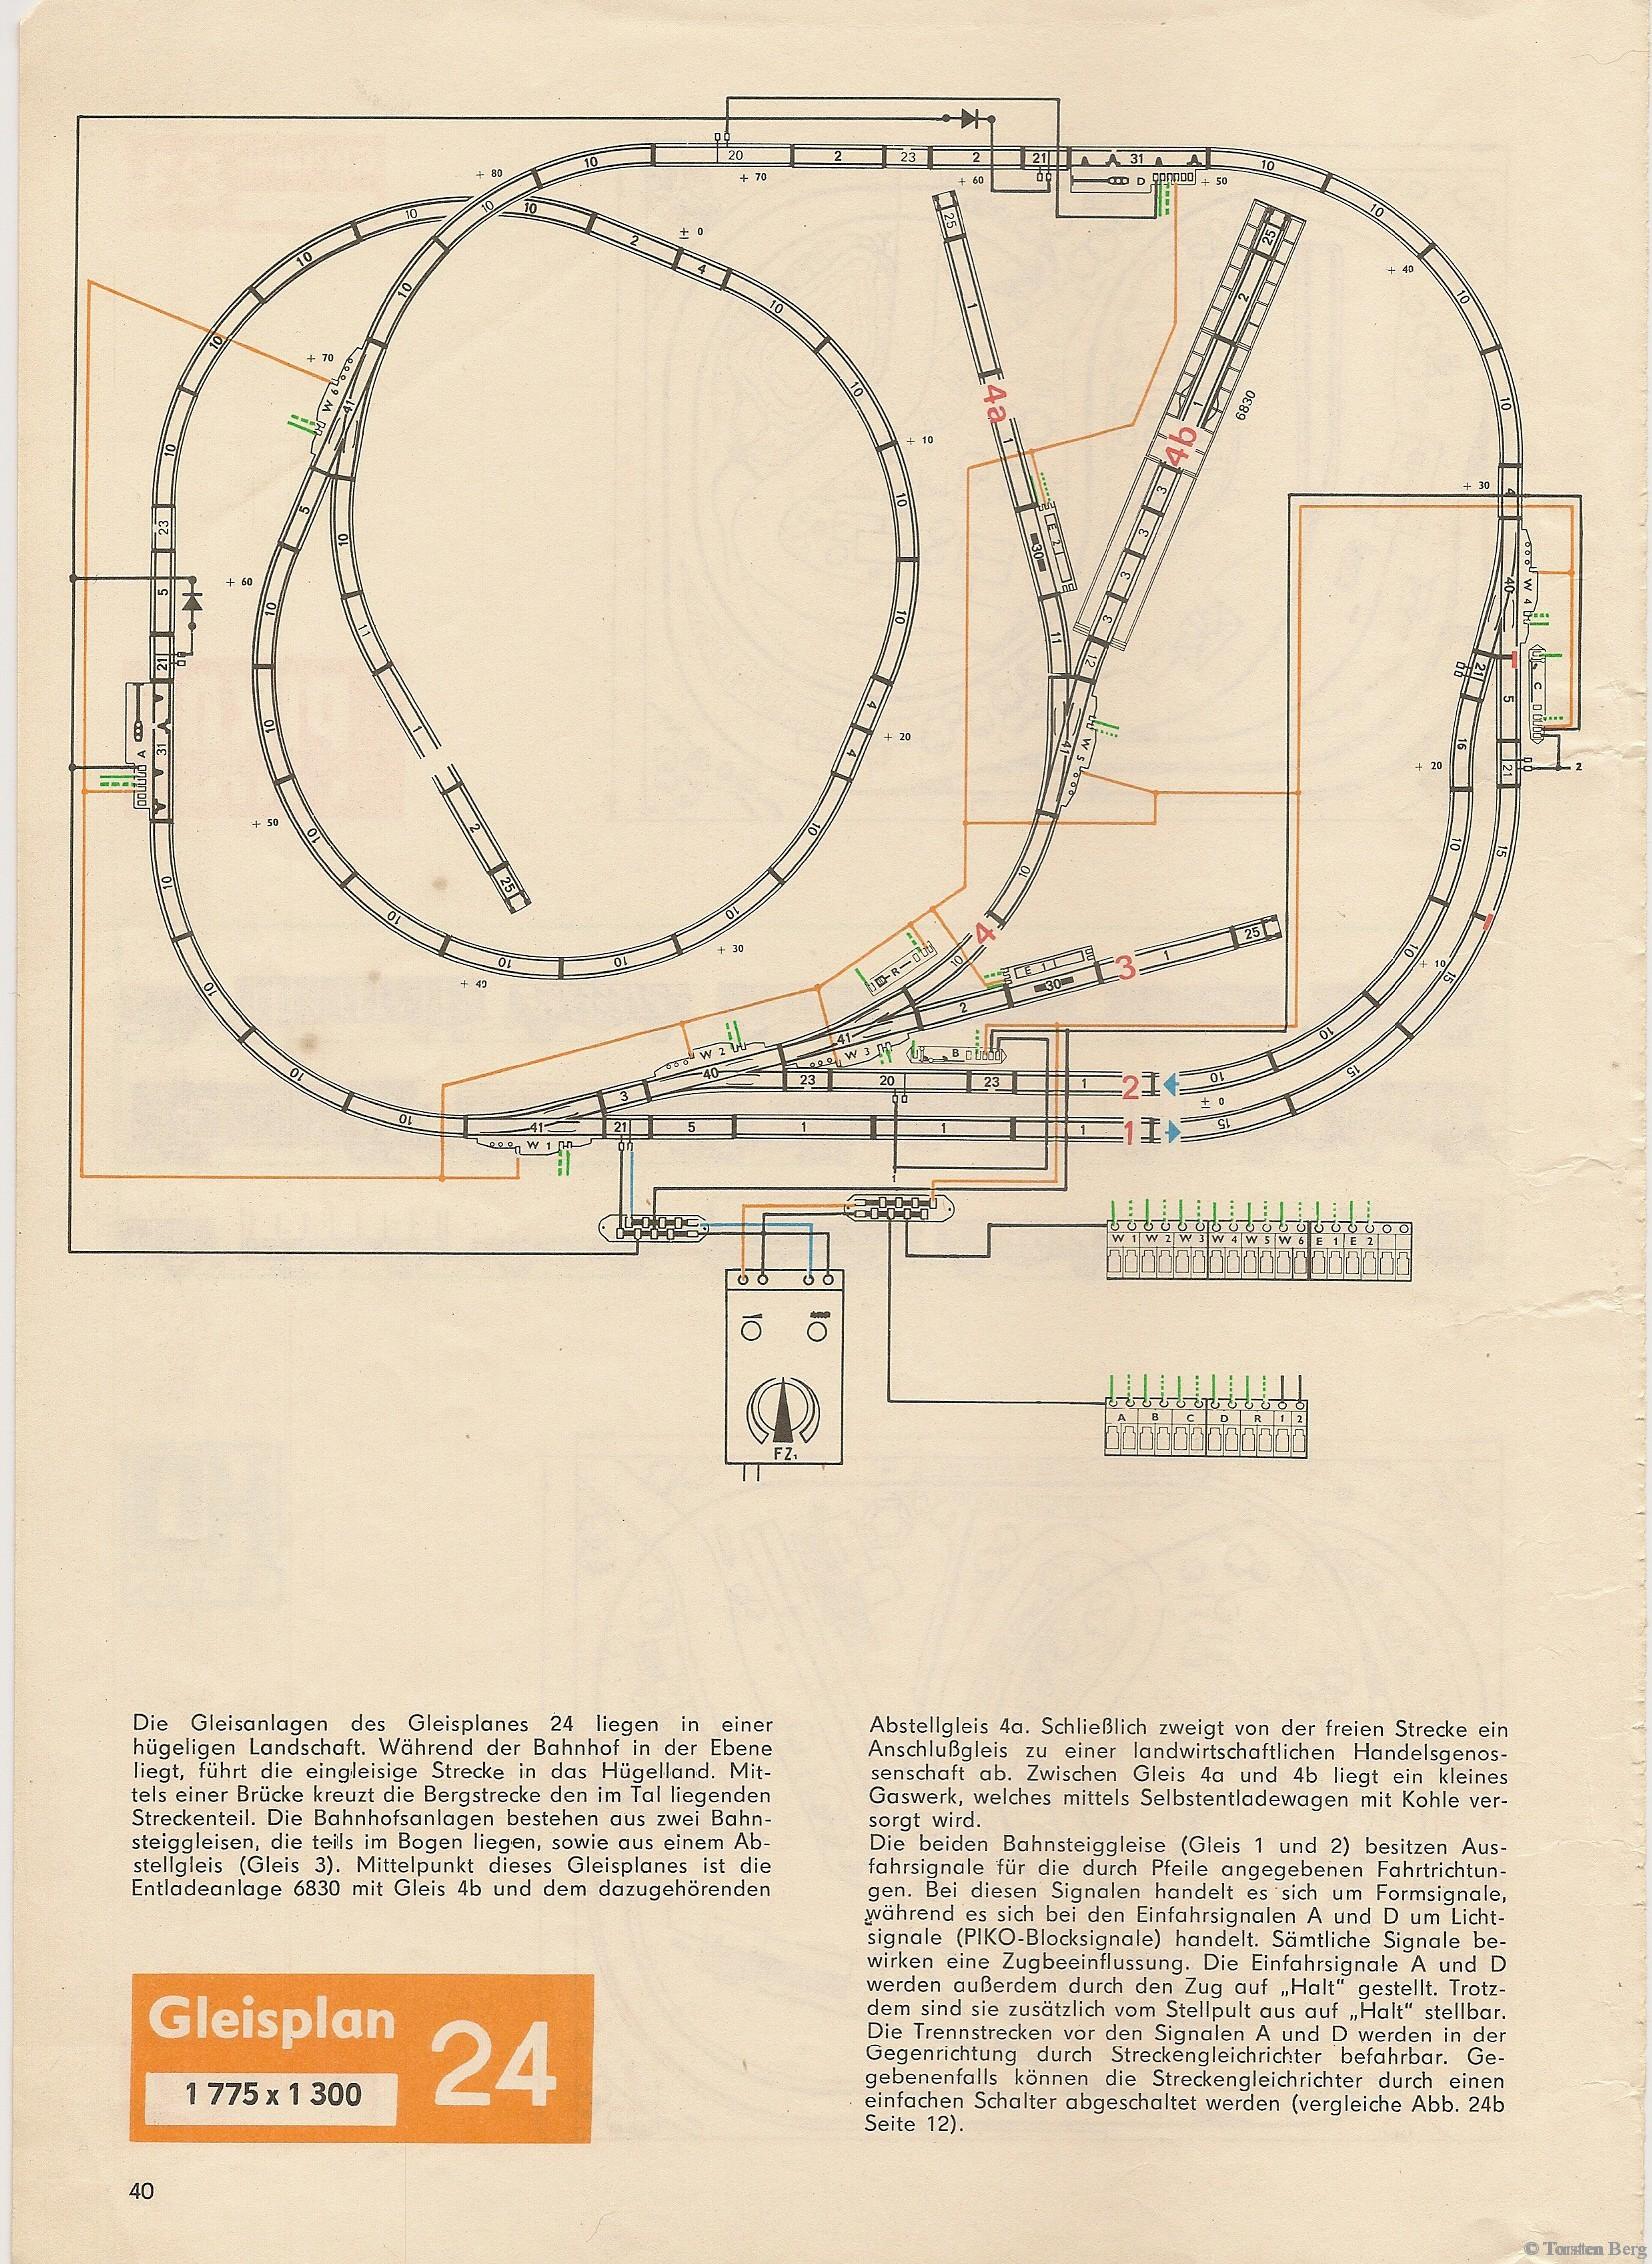 41_PIKO Standardgleis-Gleisplan 24